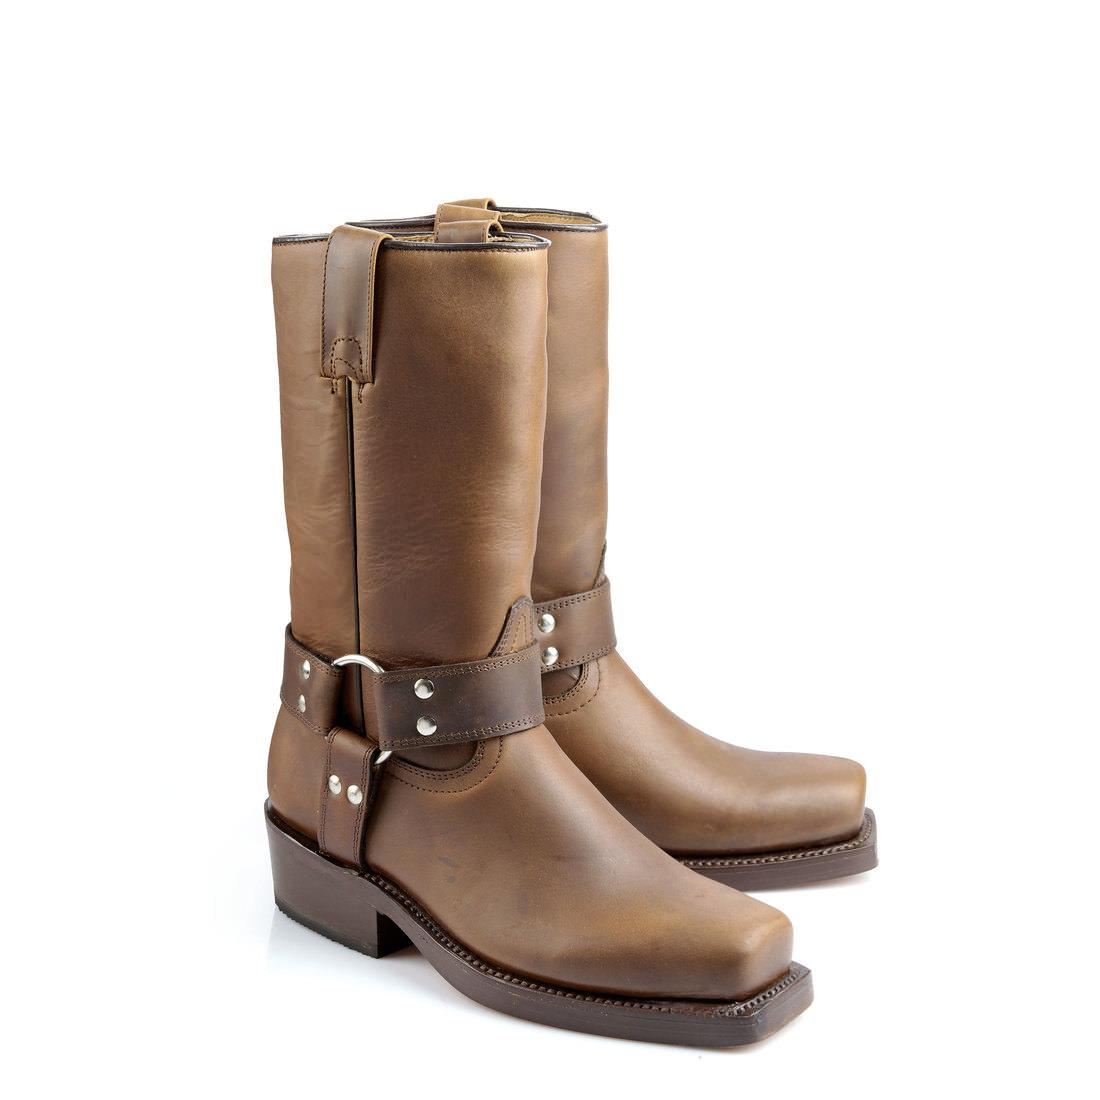 Boots fourrées Buffalo marronBuffalo gBXdJ7UO6J